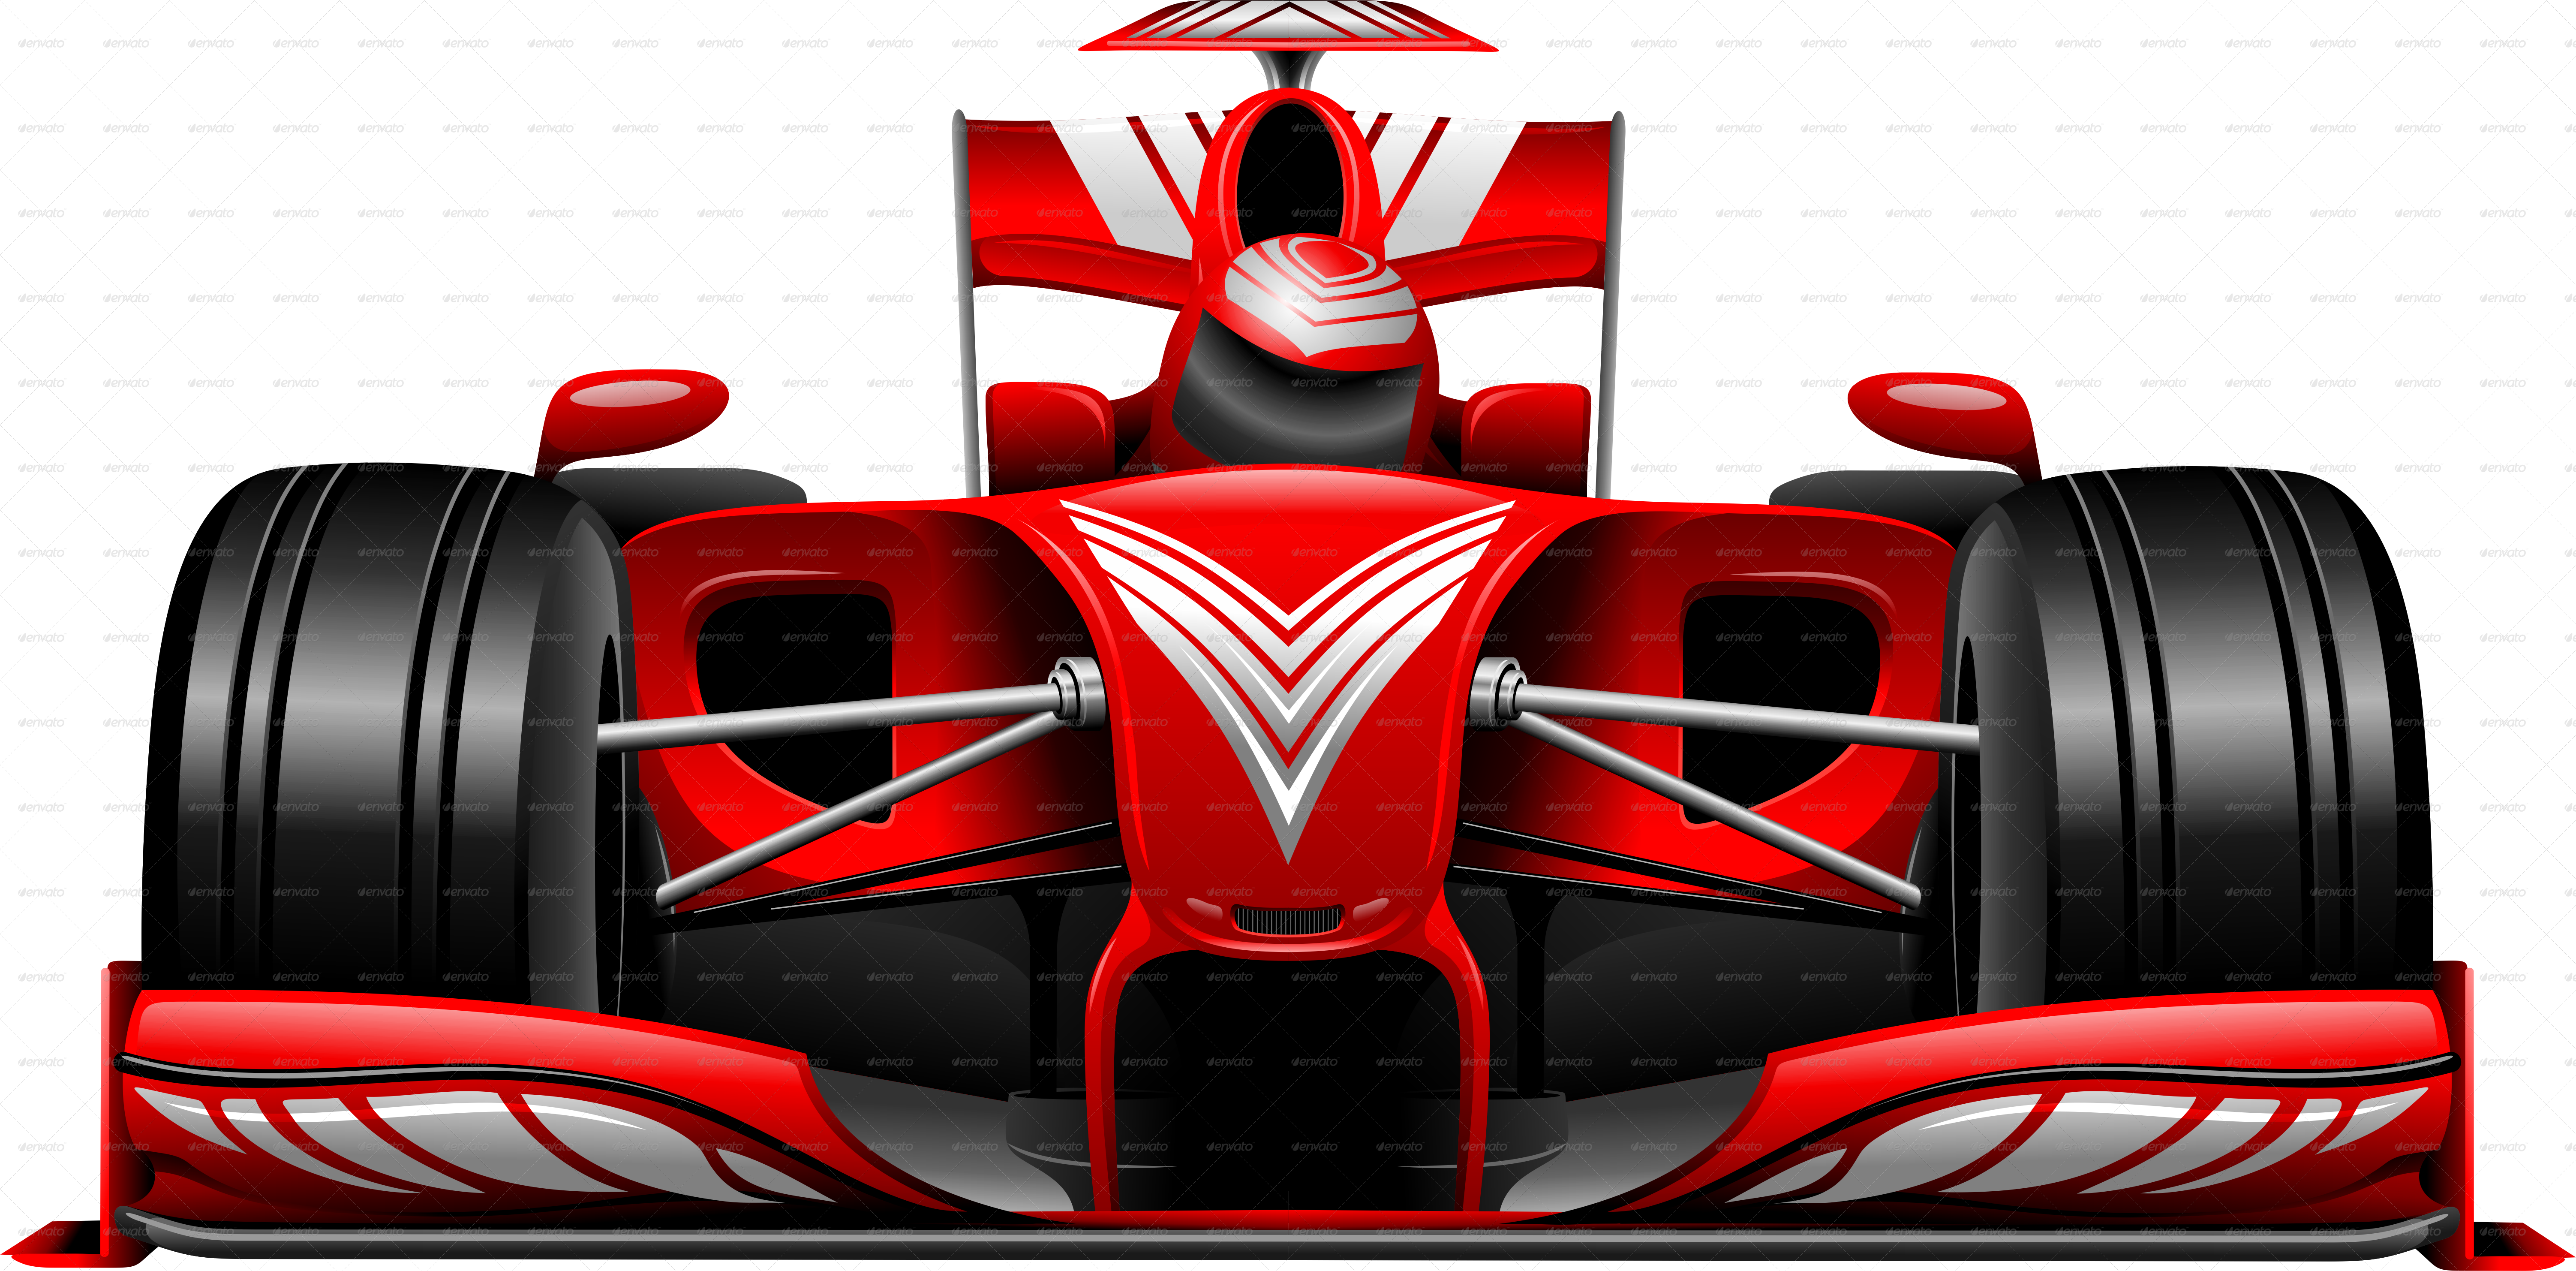 Race Car PNG Images Transparent Free Download.